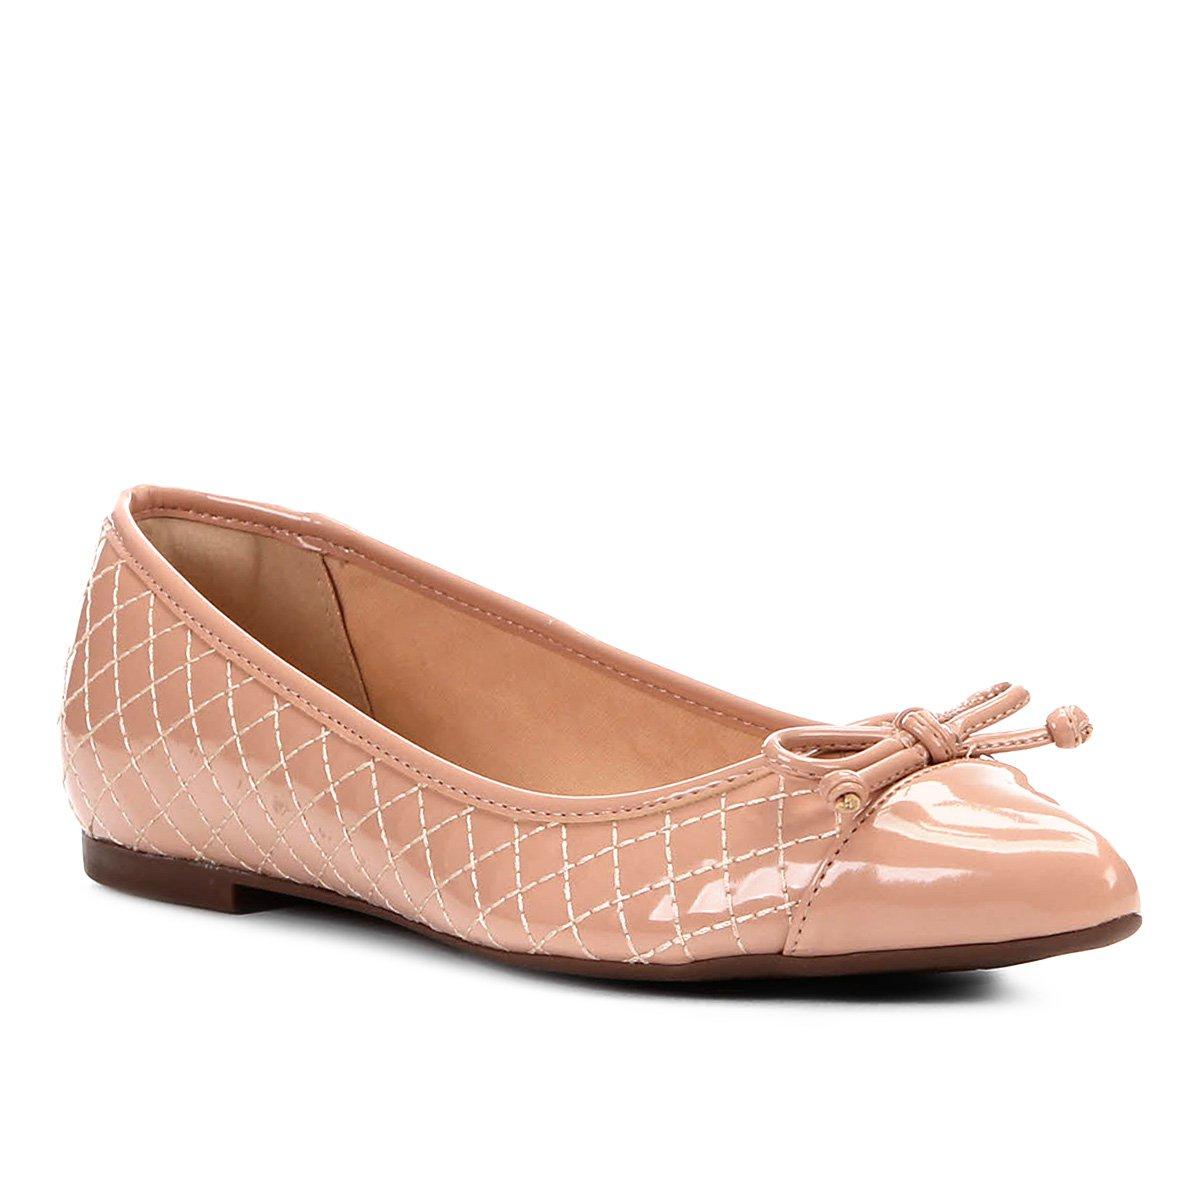 b7eabec1f Sapatilha Shoestock Matelassê Bico Fino Laço Feminina - Rosa Claro |  Shoestock